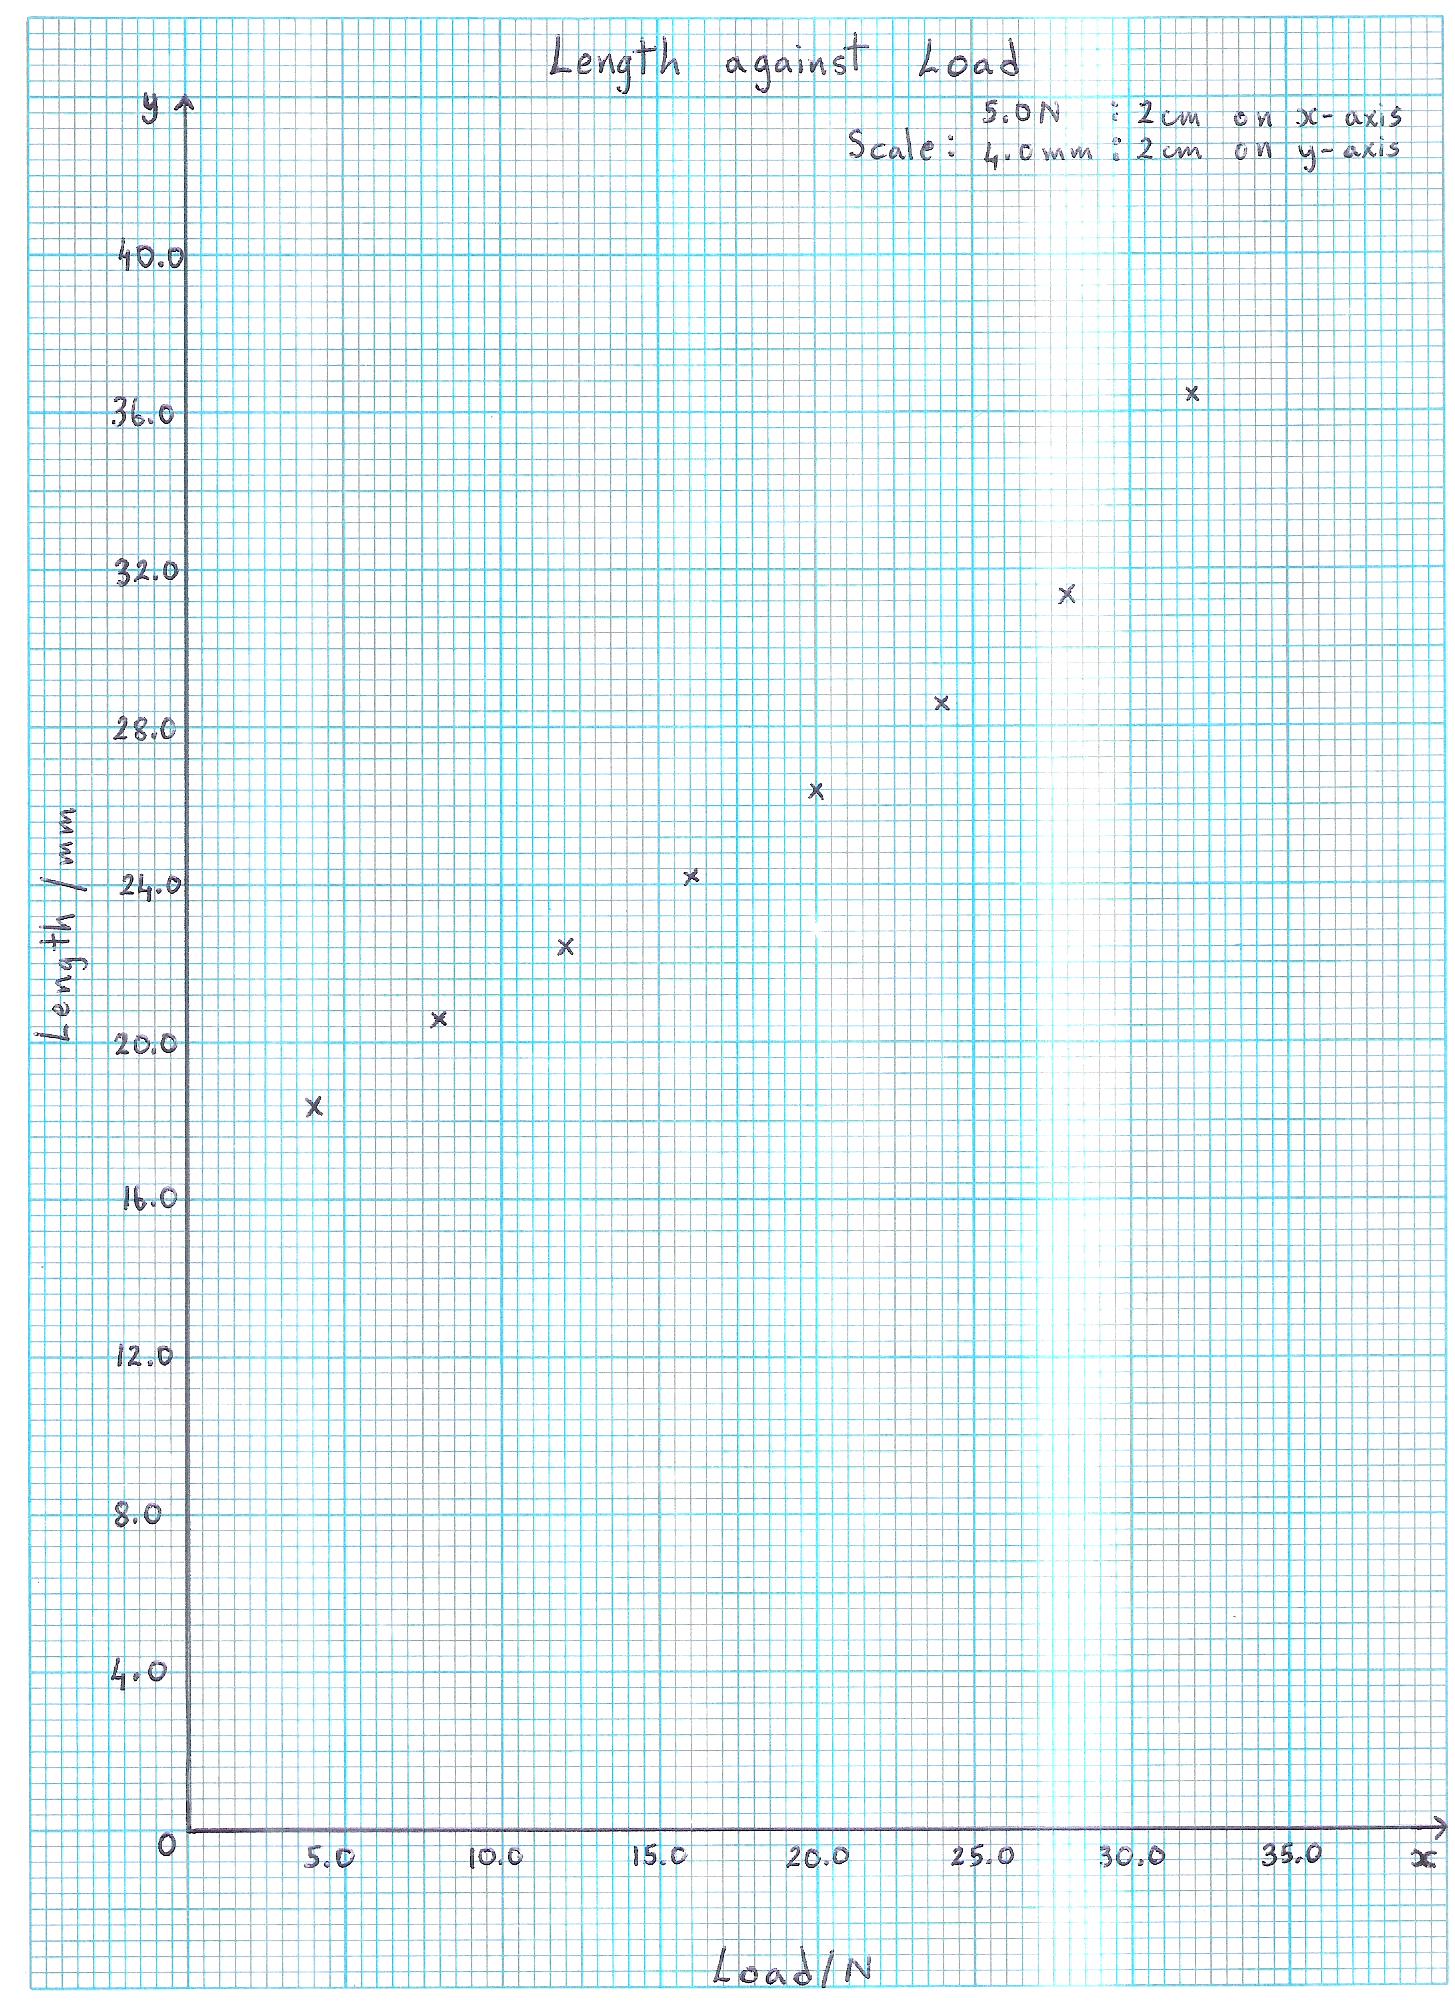 Plotting Straight Line Graphs Example 2 - Step 4 | Plotting